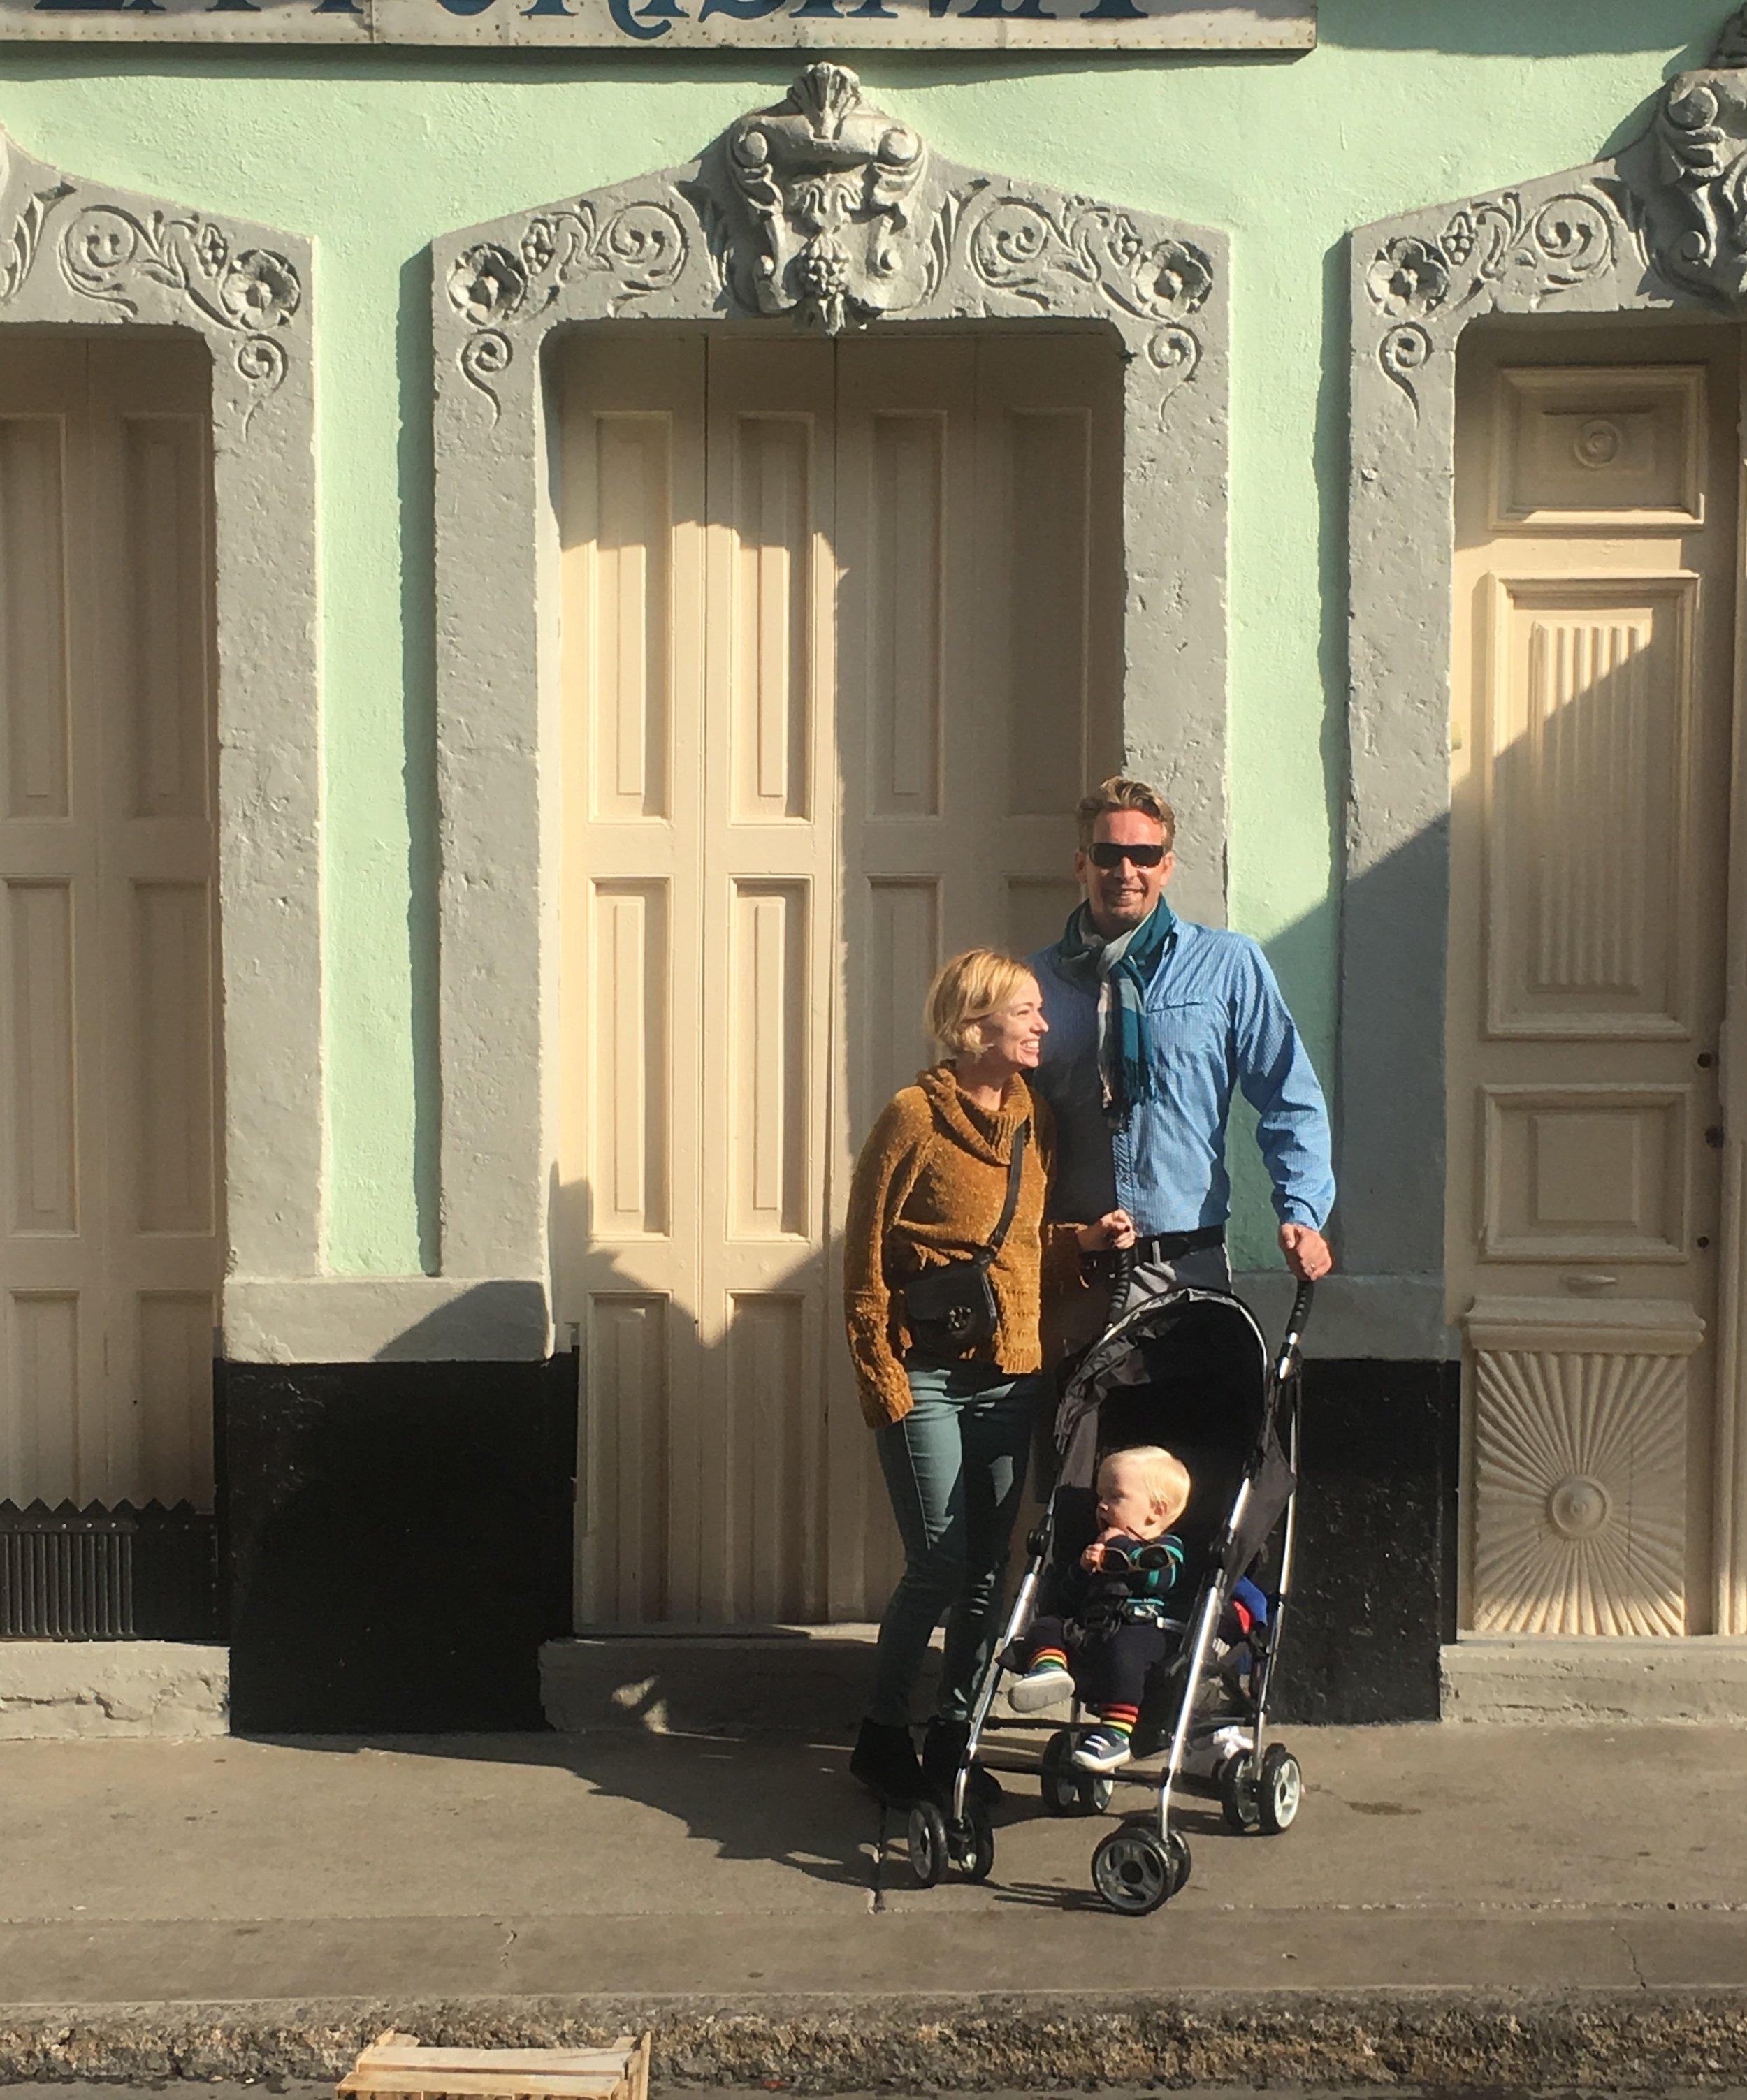 Annie, Tyler & baby Gabriel  - in Mexico City (2018)